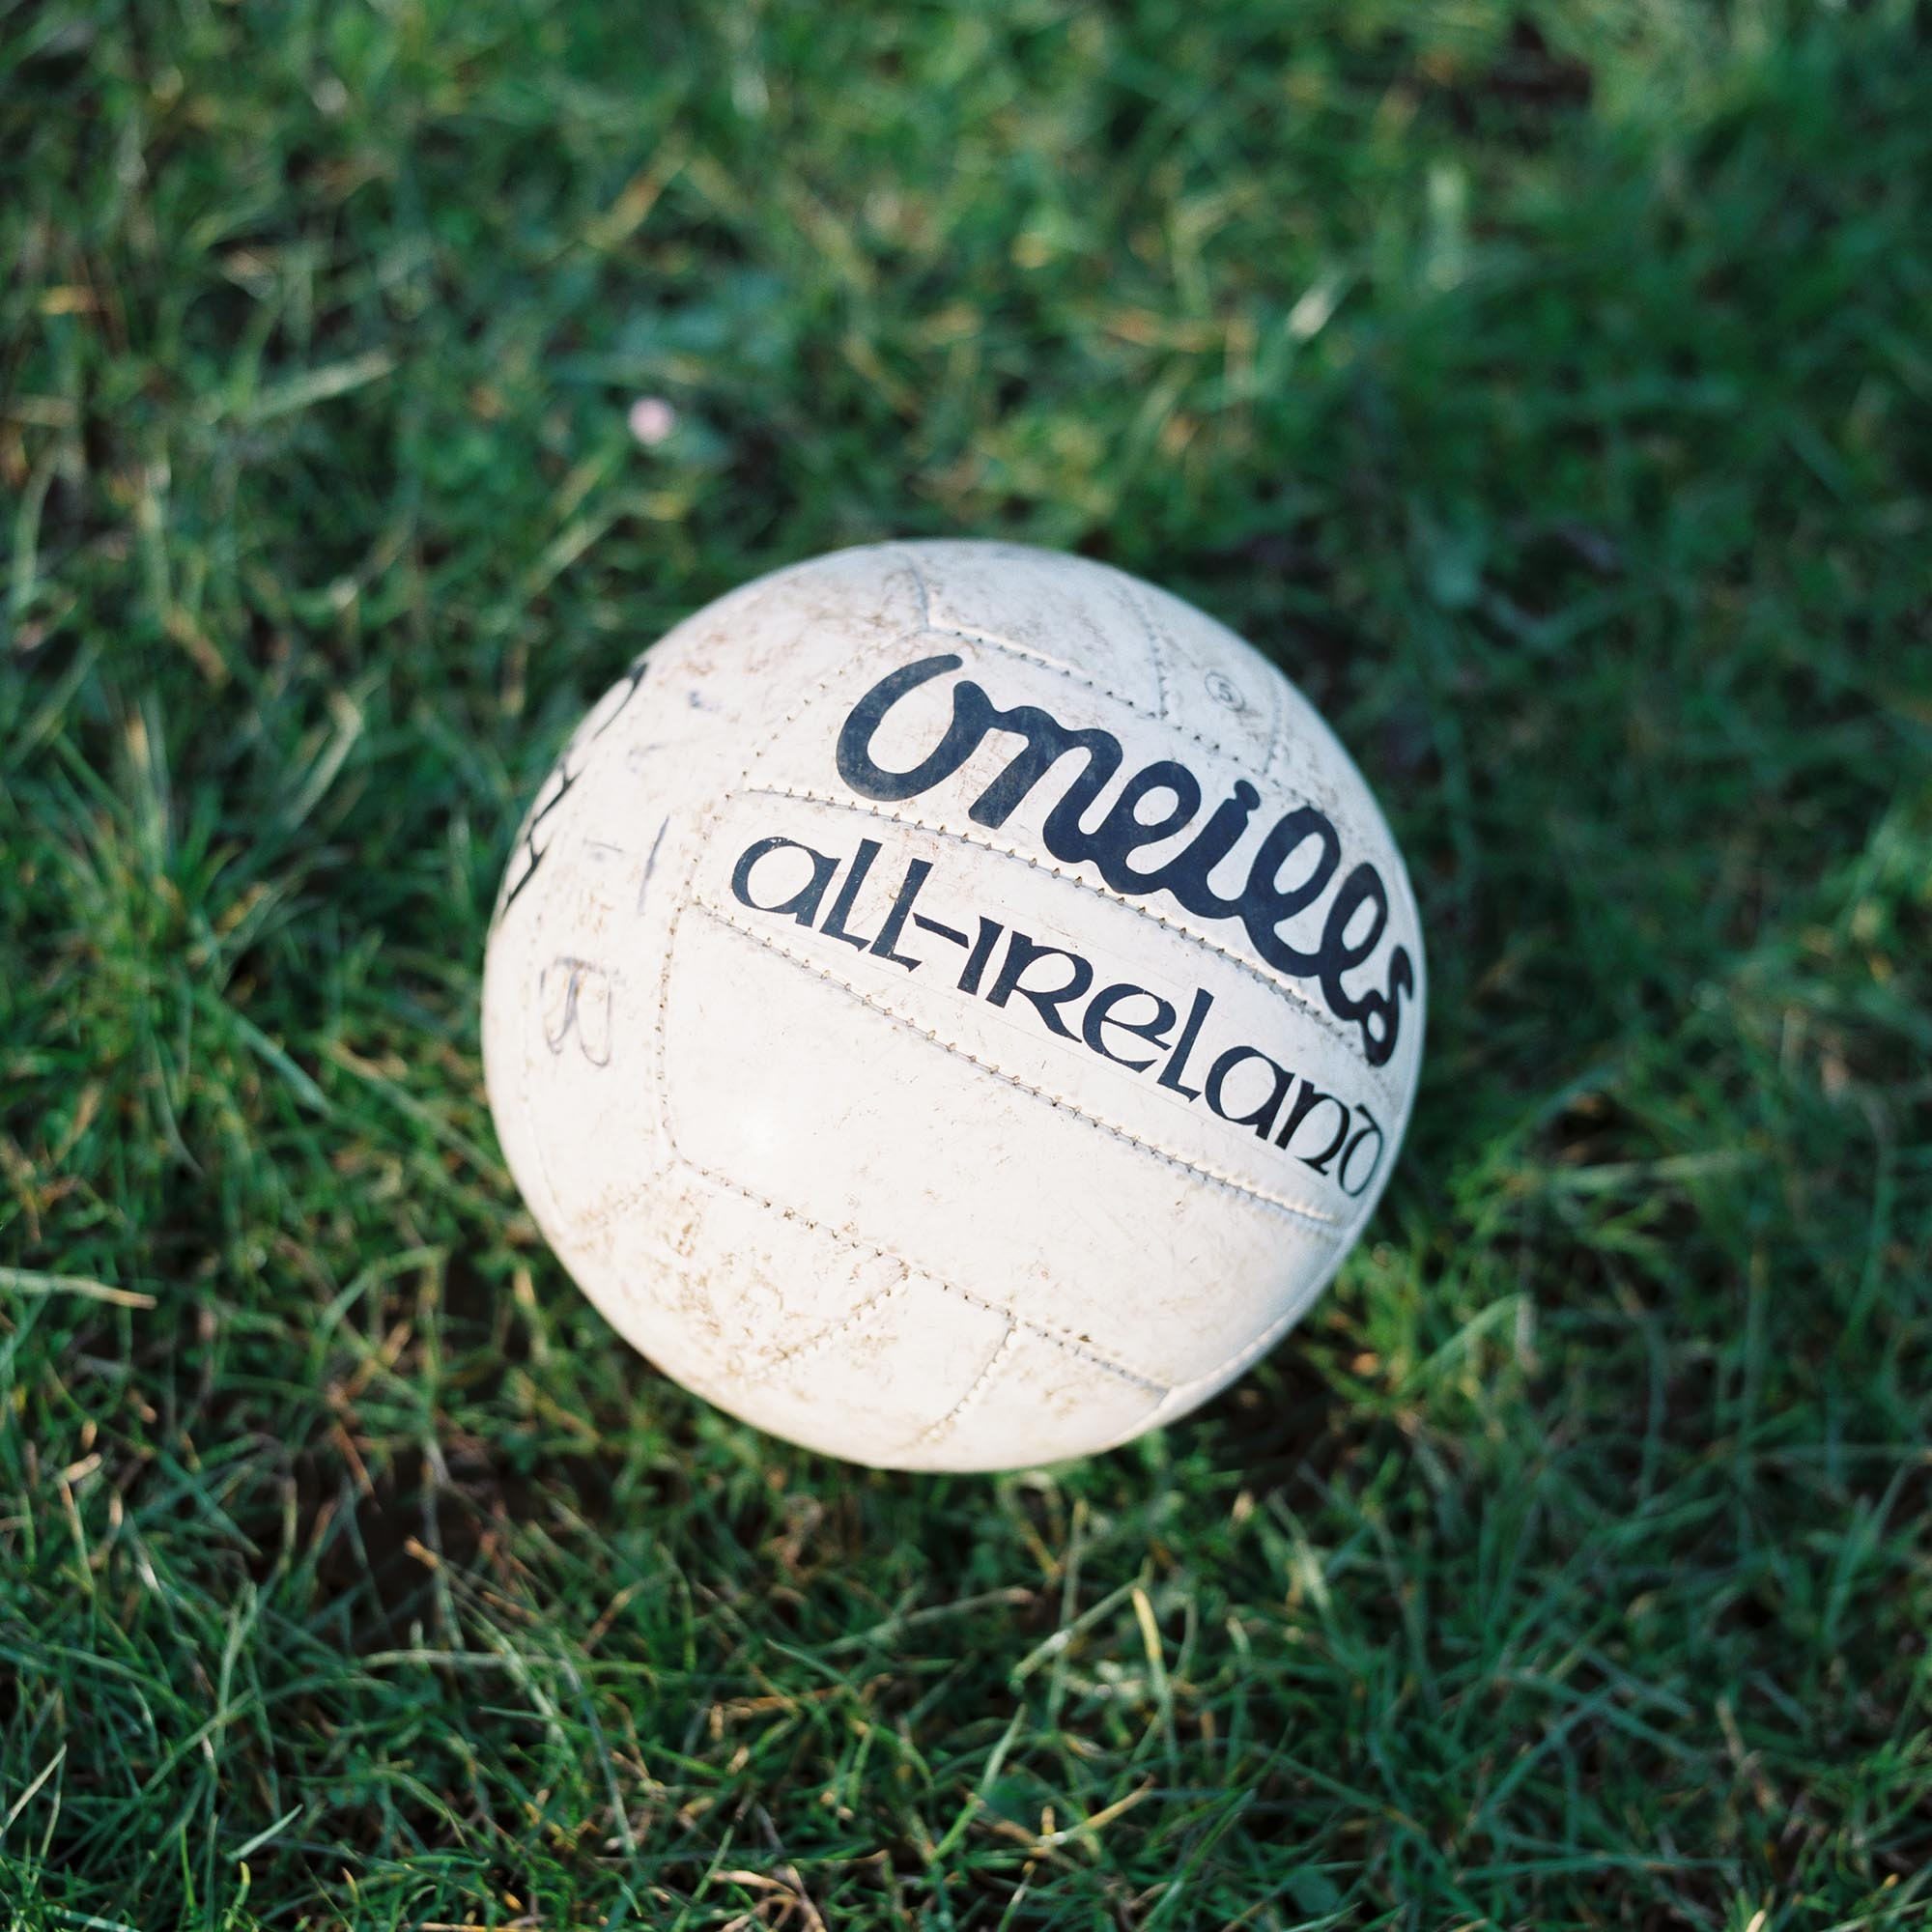 A GAA football